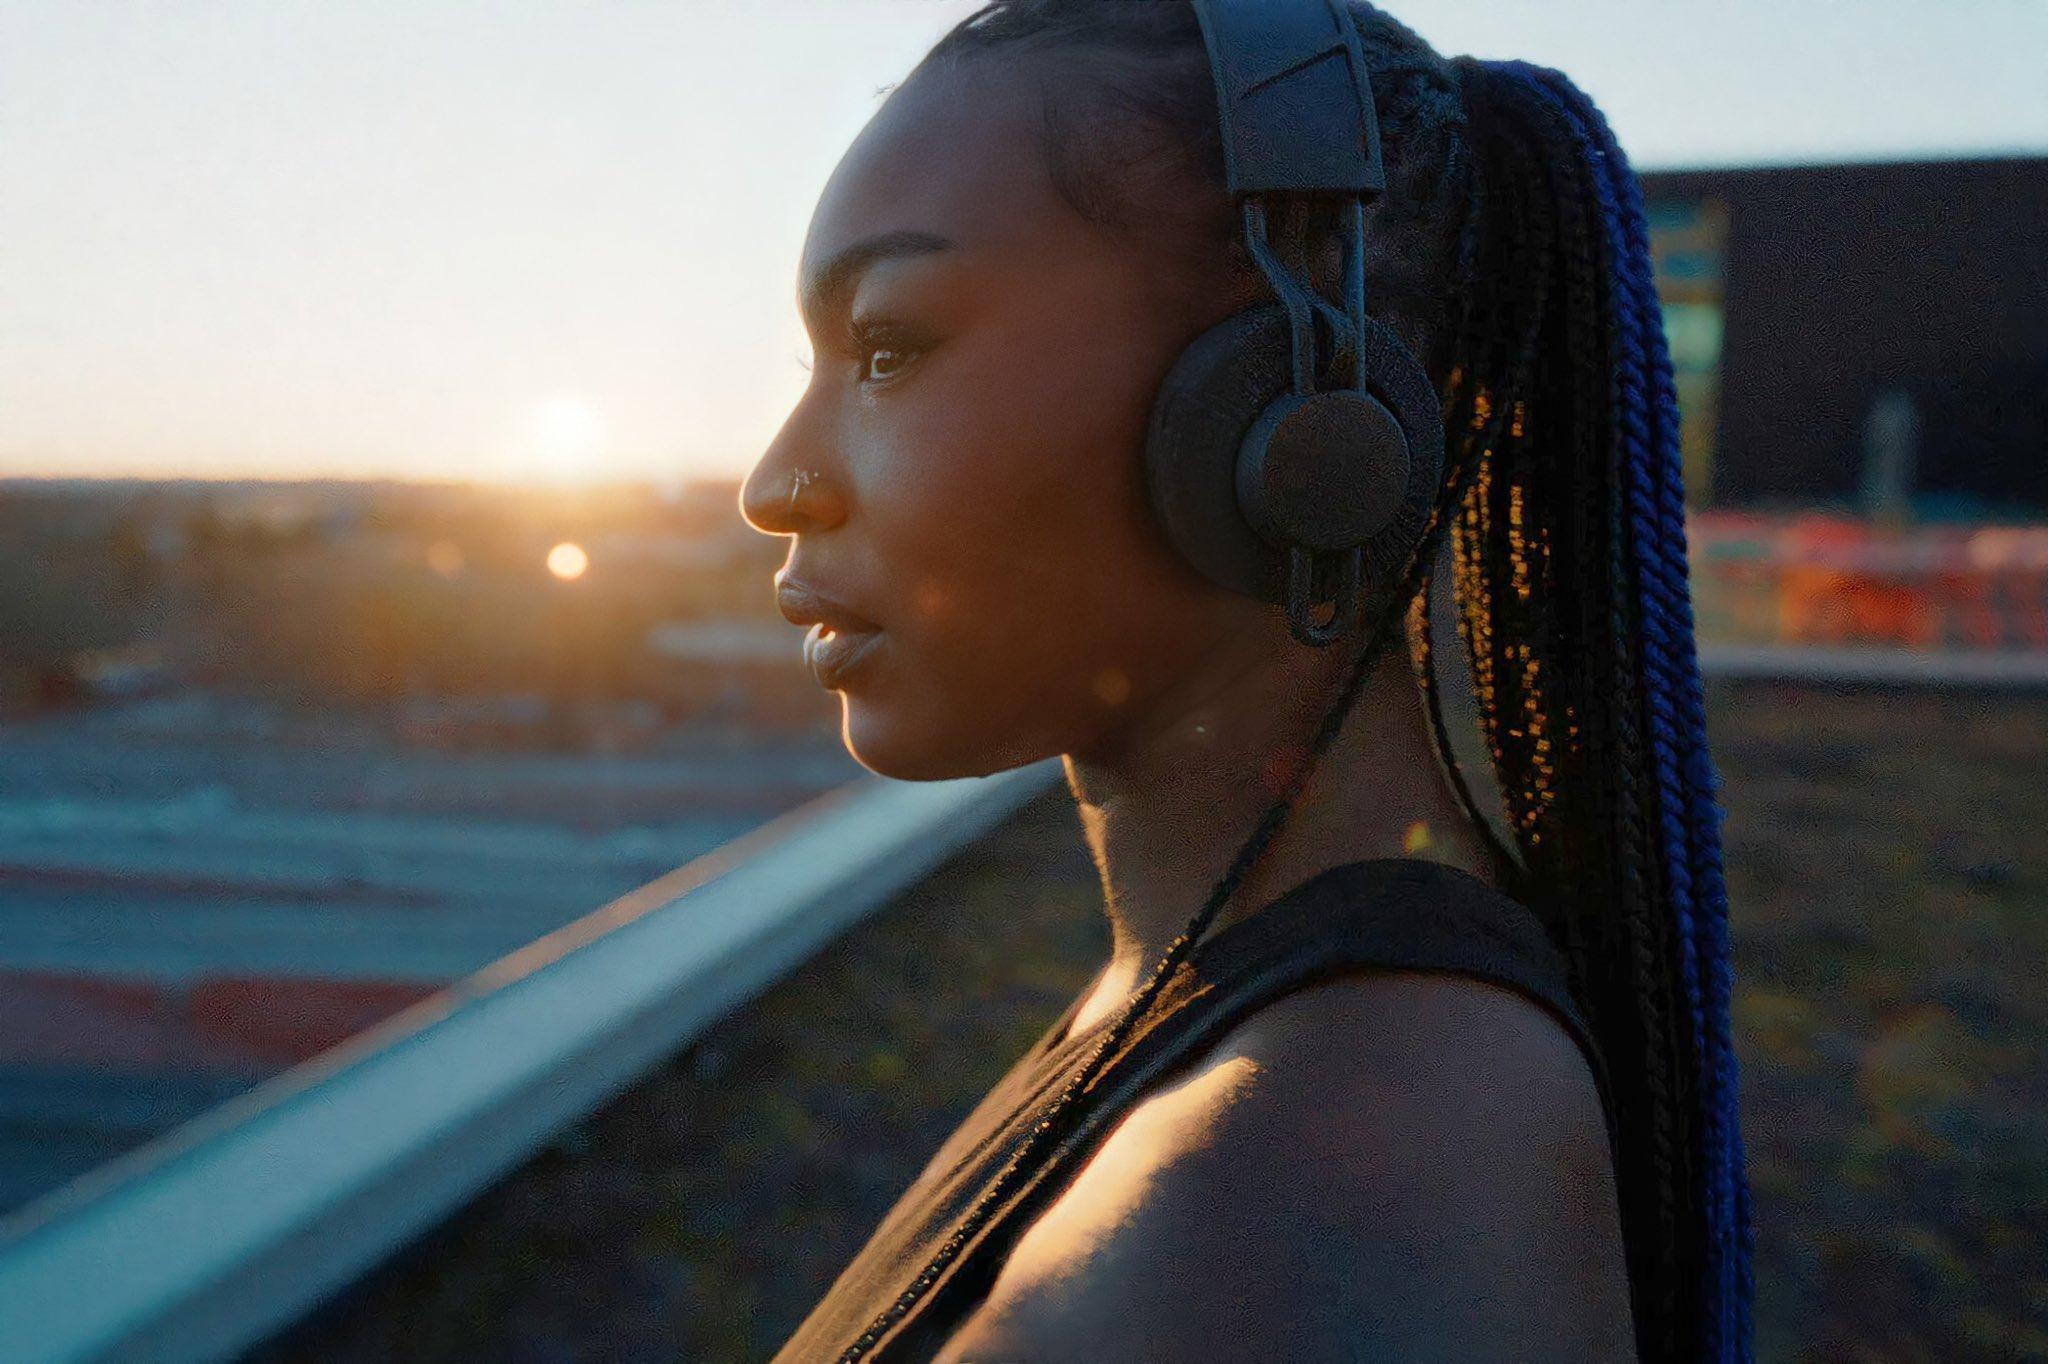 Adidas unveils environment friendly solar-powered headphones